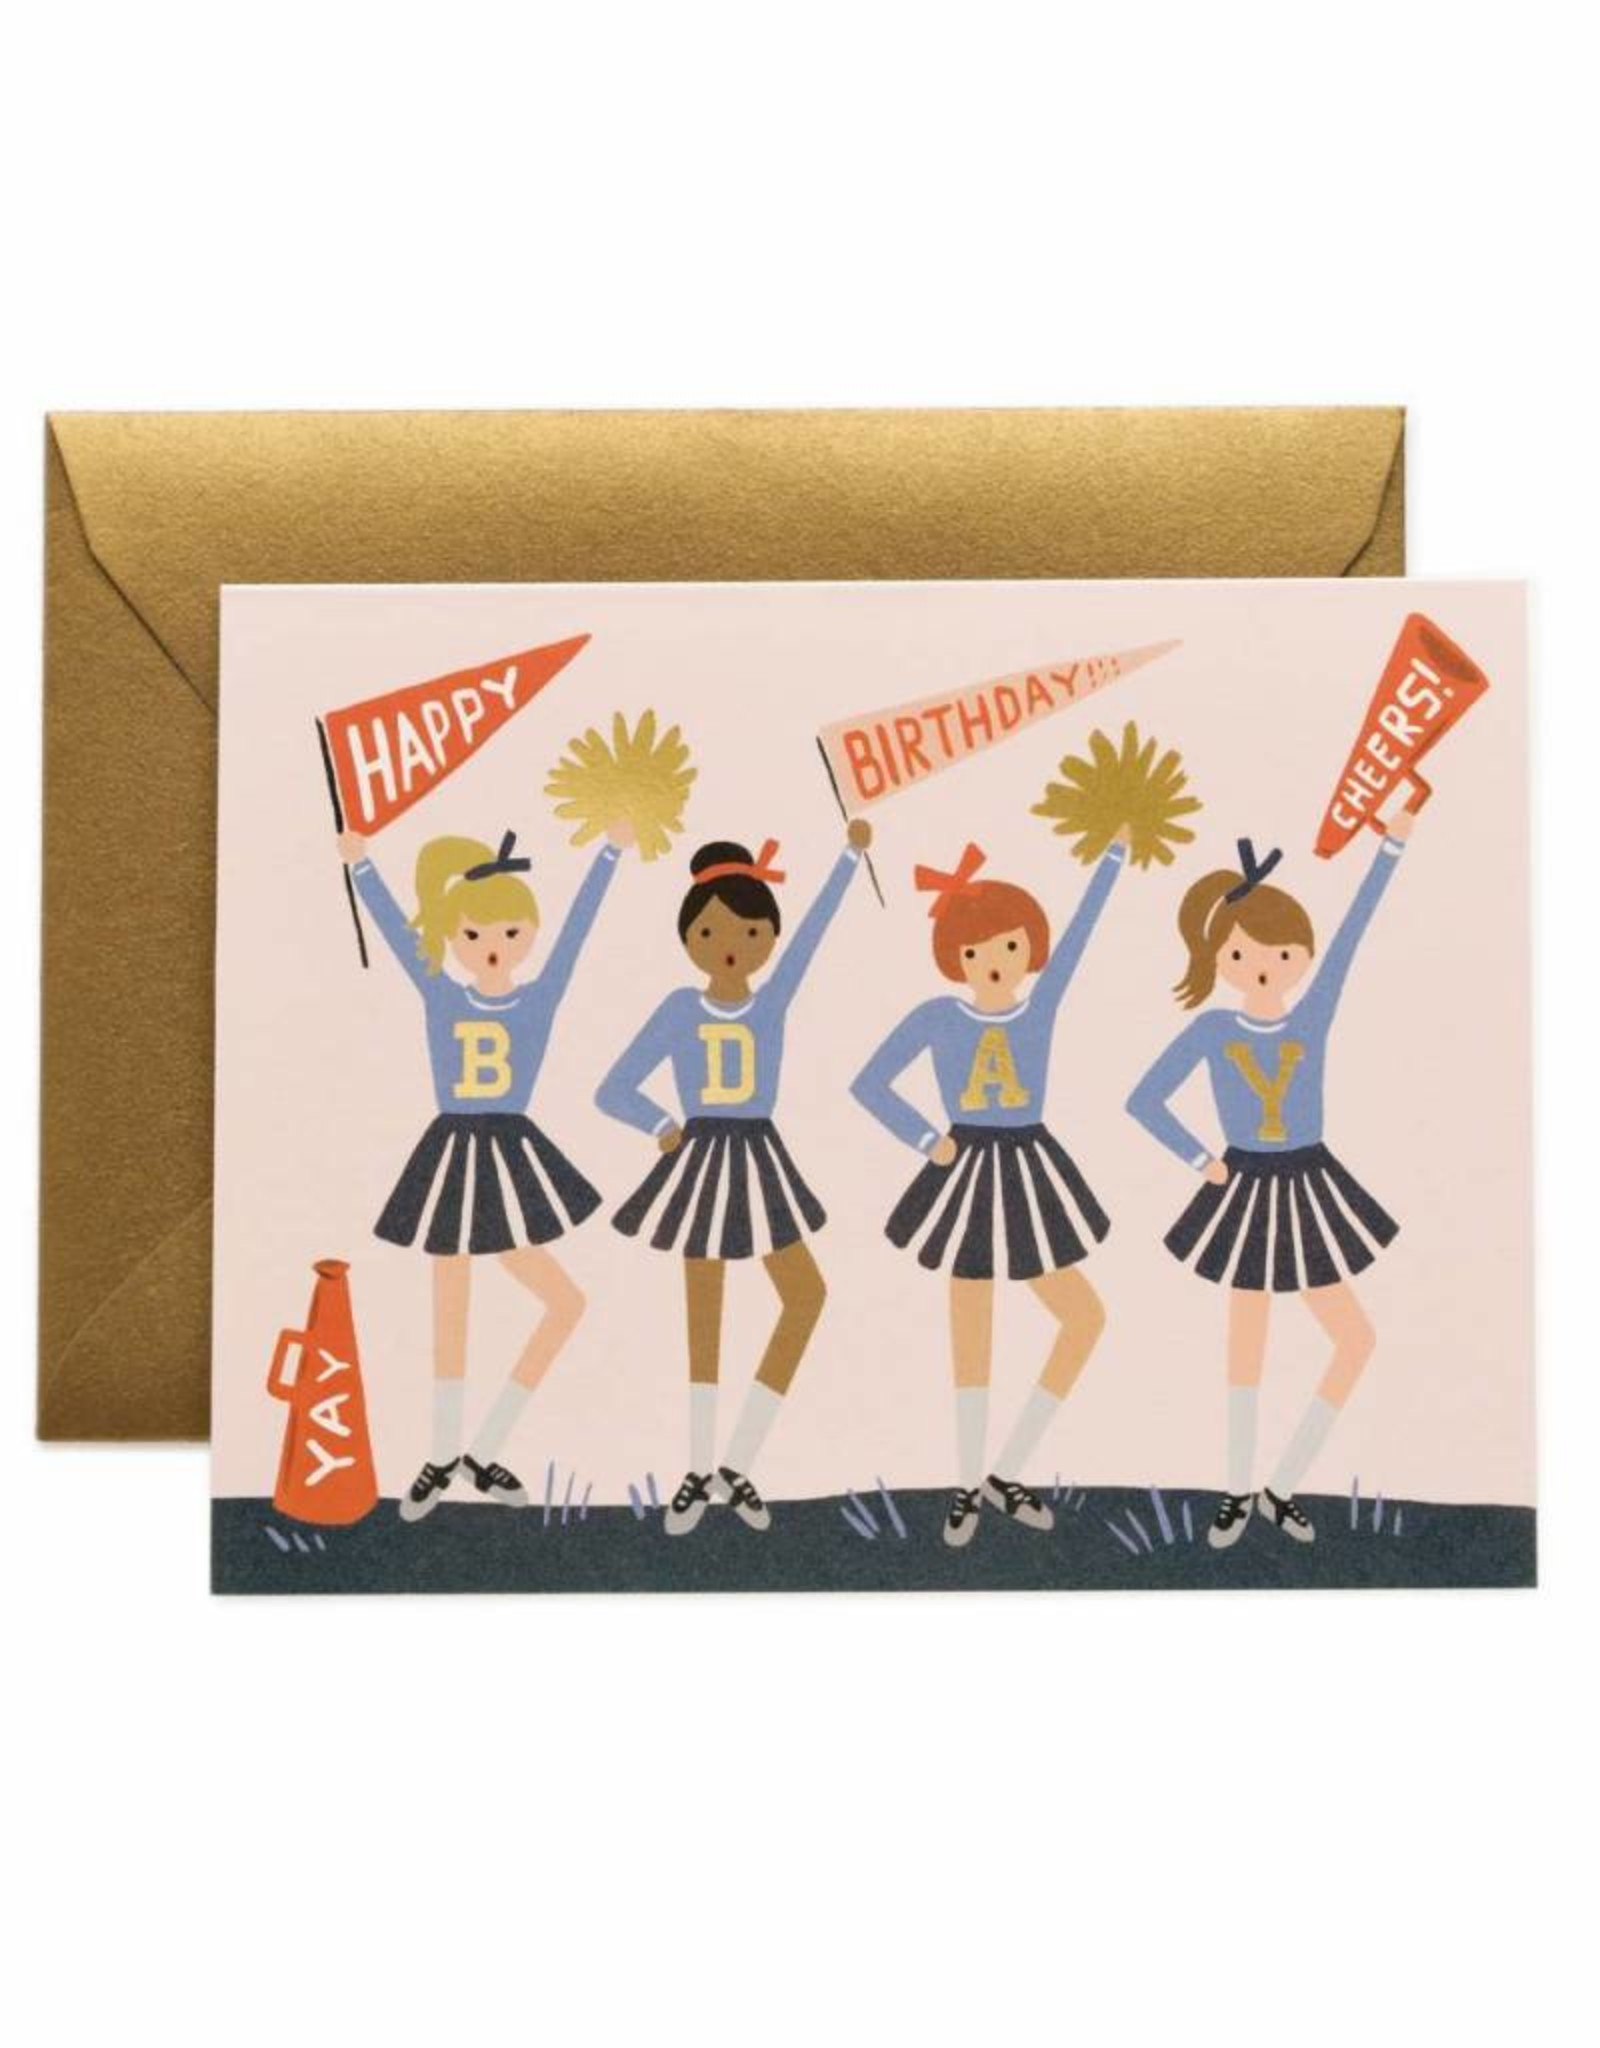 Rifle Paper Co. cheer birthday card